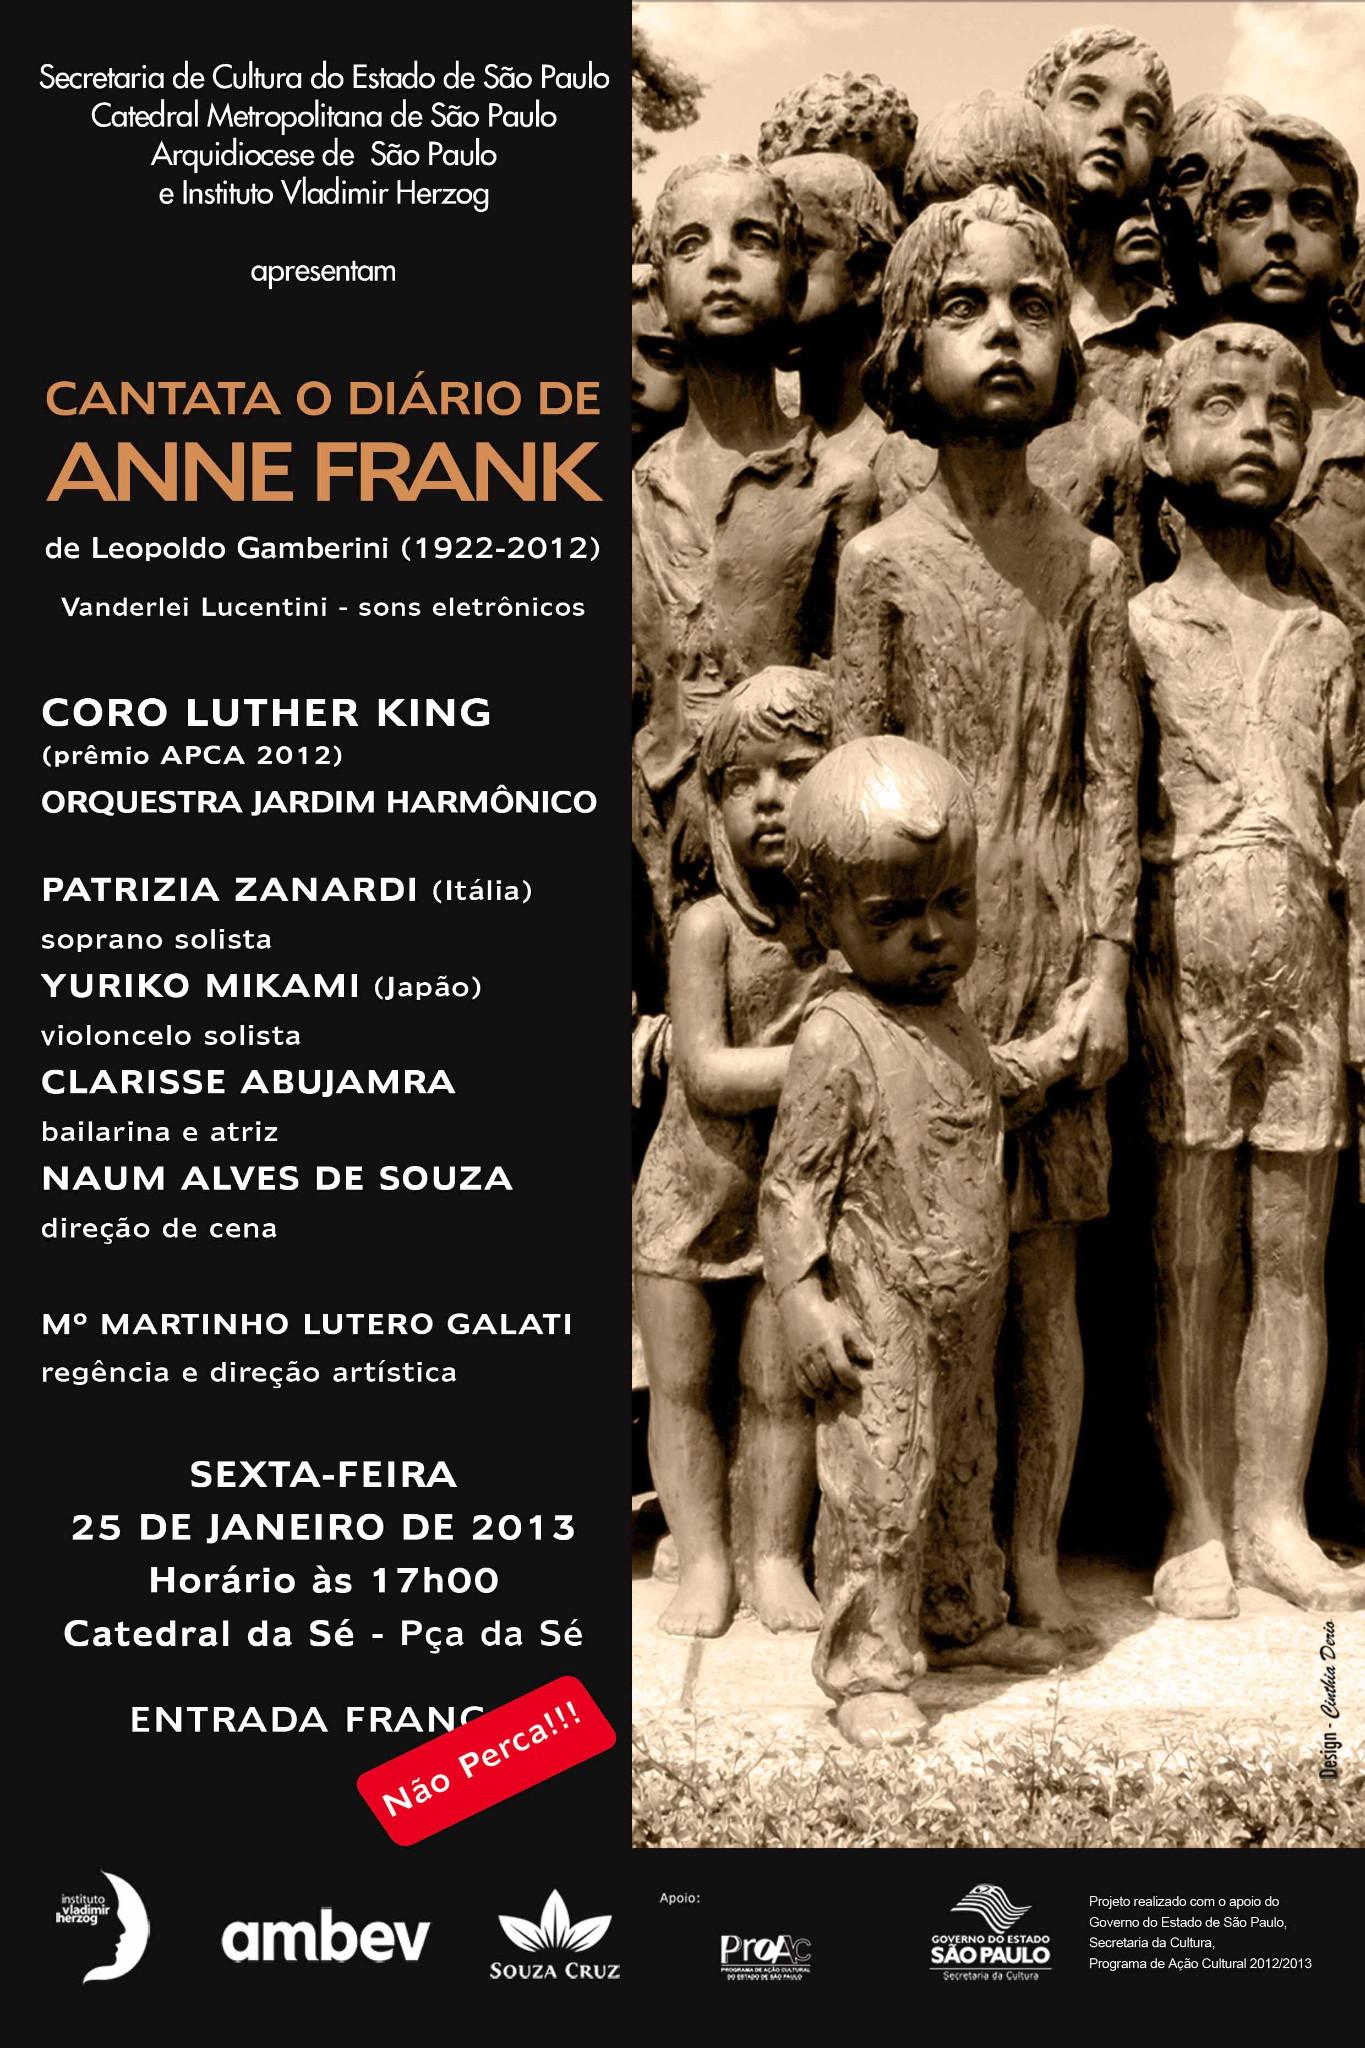 Frases Do Diario De Anne Frank 2 Quotes Links